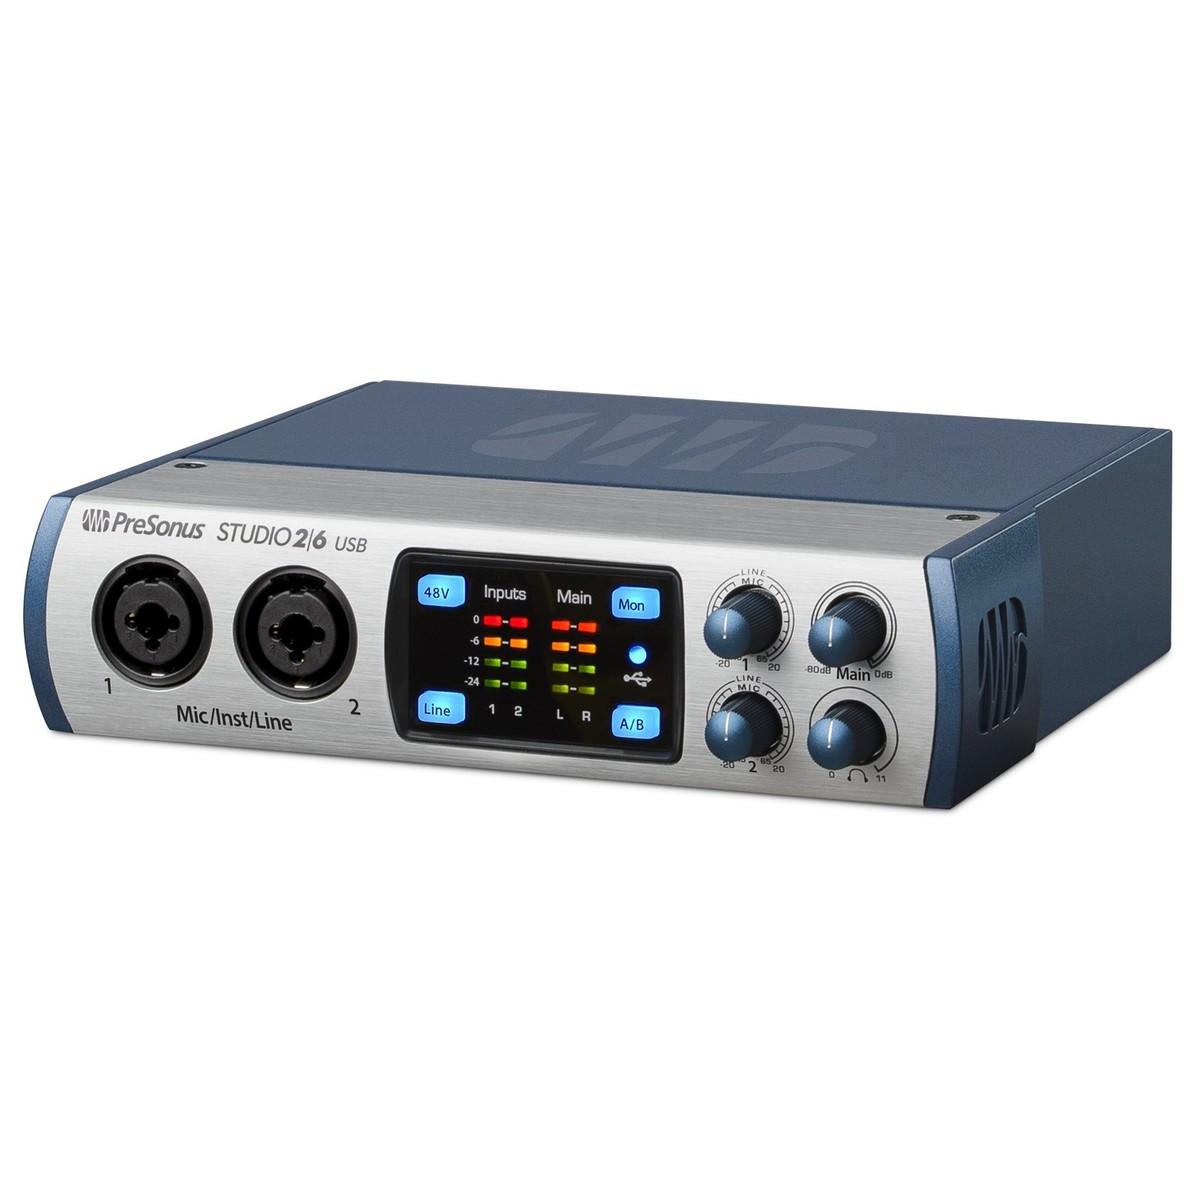 presonus studio 2 6 audio interface at gear4music. Black Bedroom Furniture Sets. Home Design Ideas